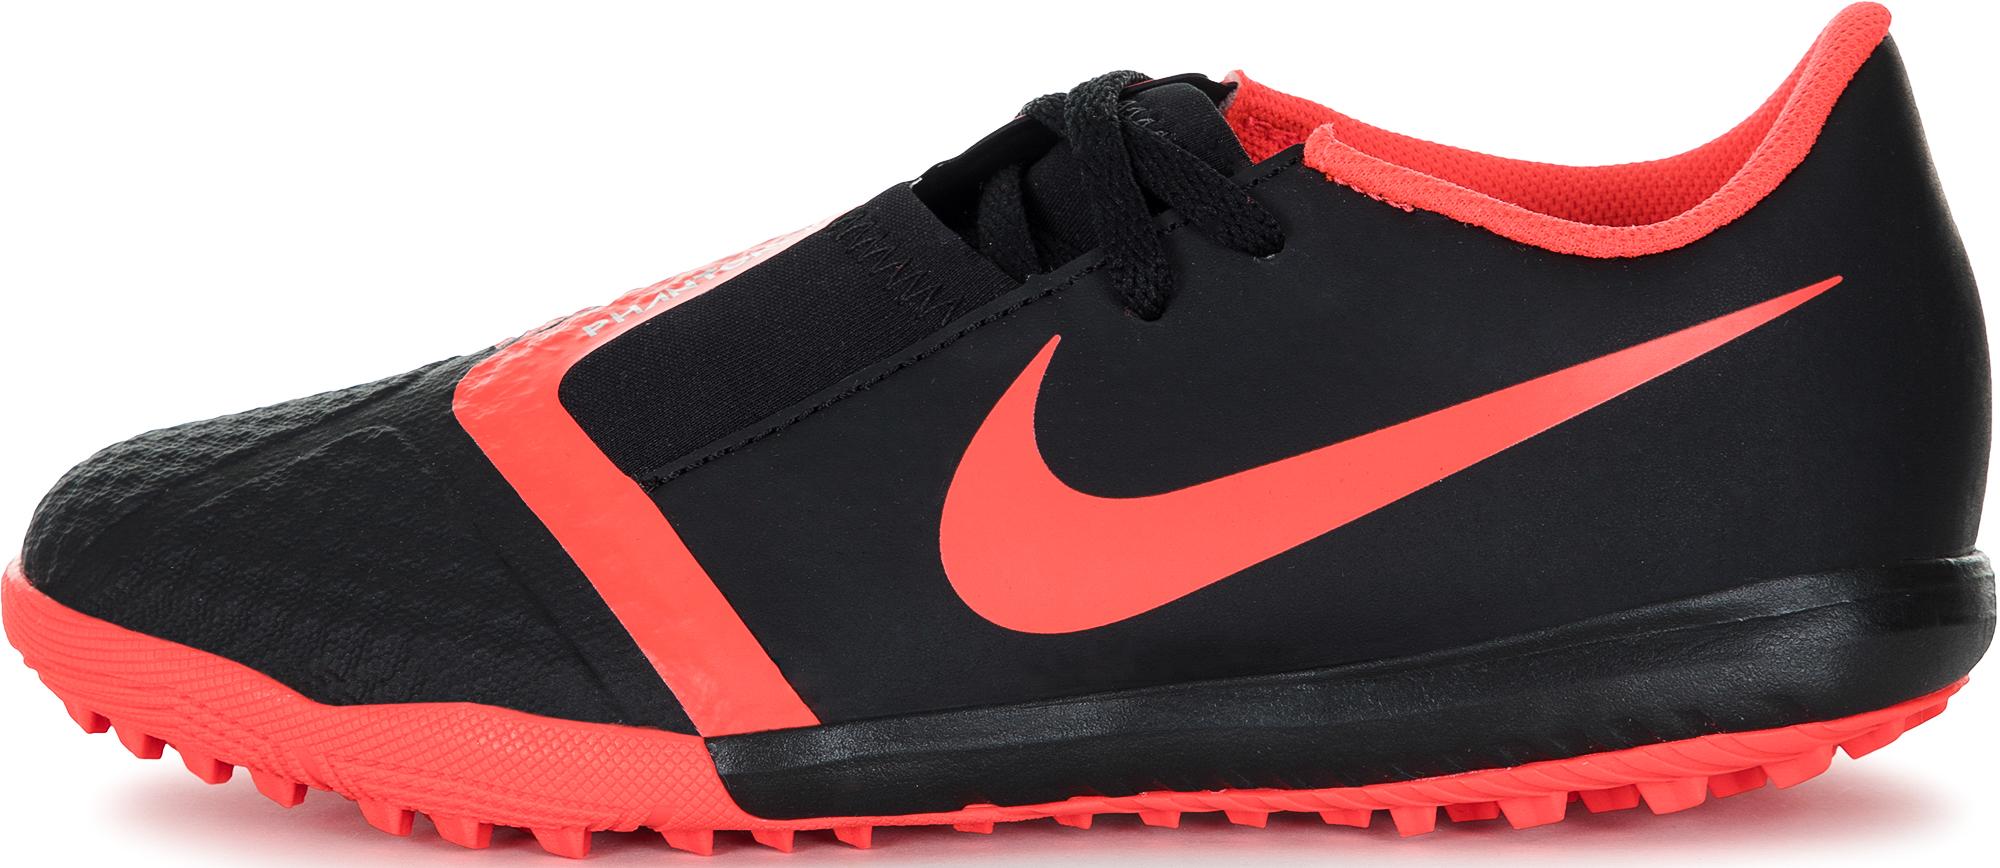 Nike Бутсы для мальчиков Phantom Venom Academy TF, размер 35